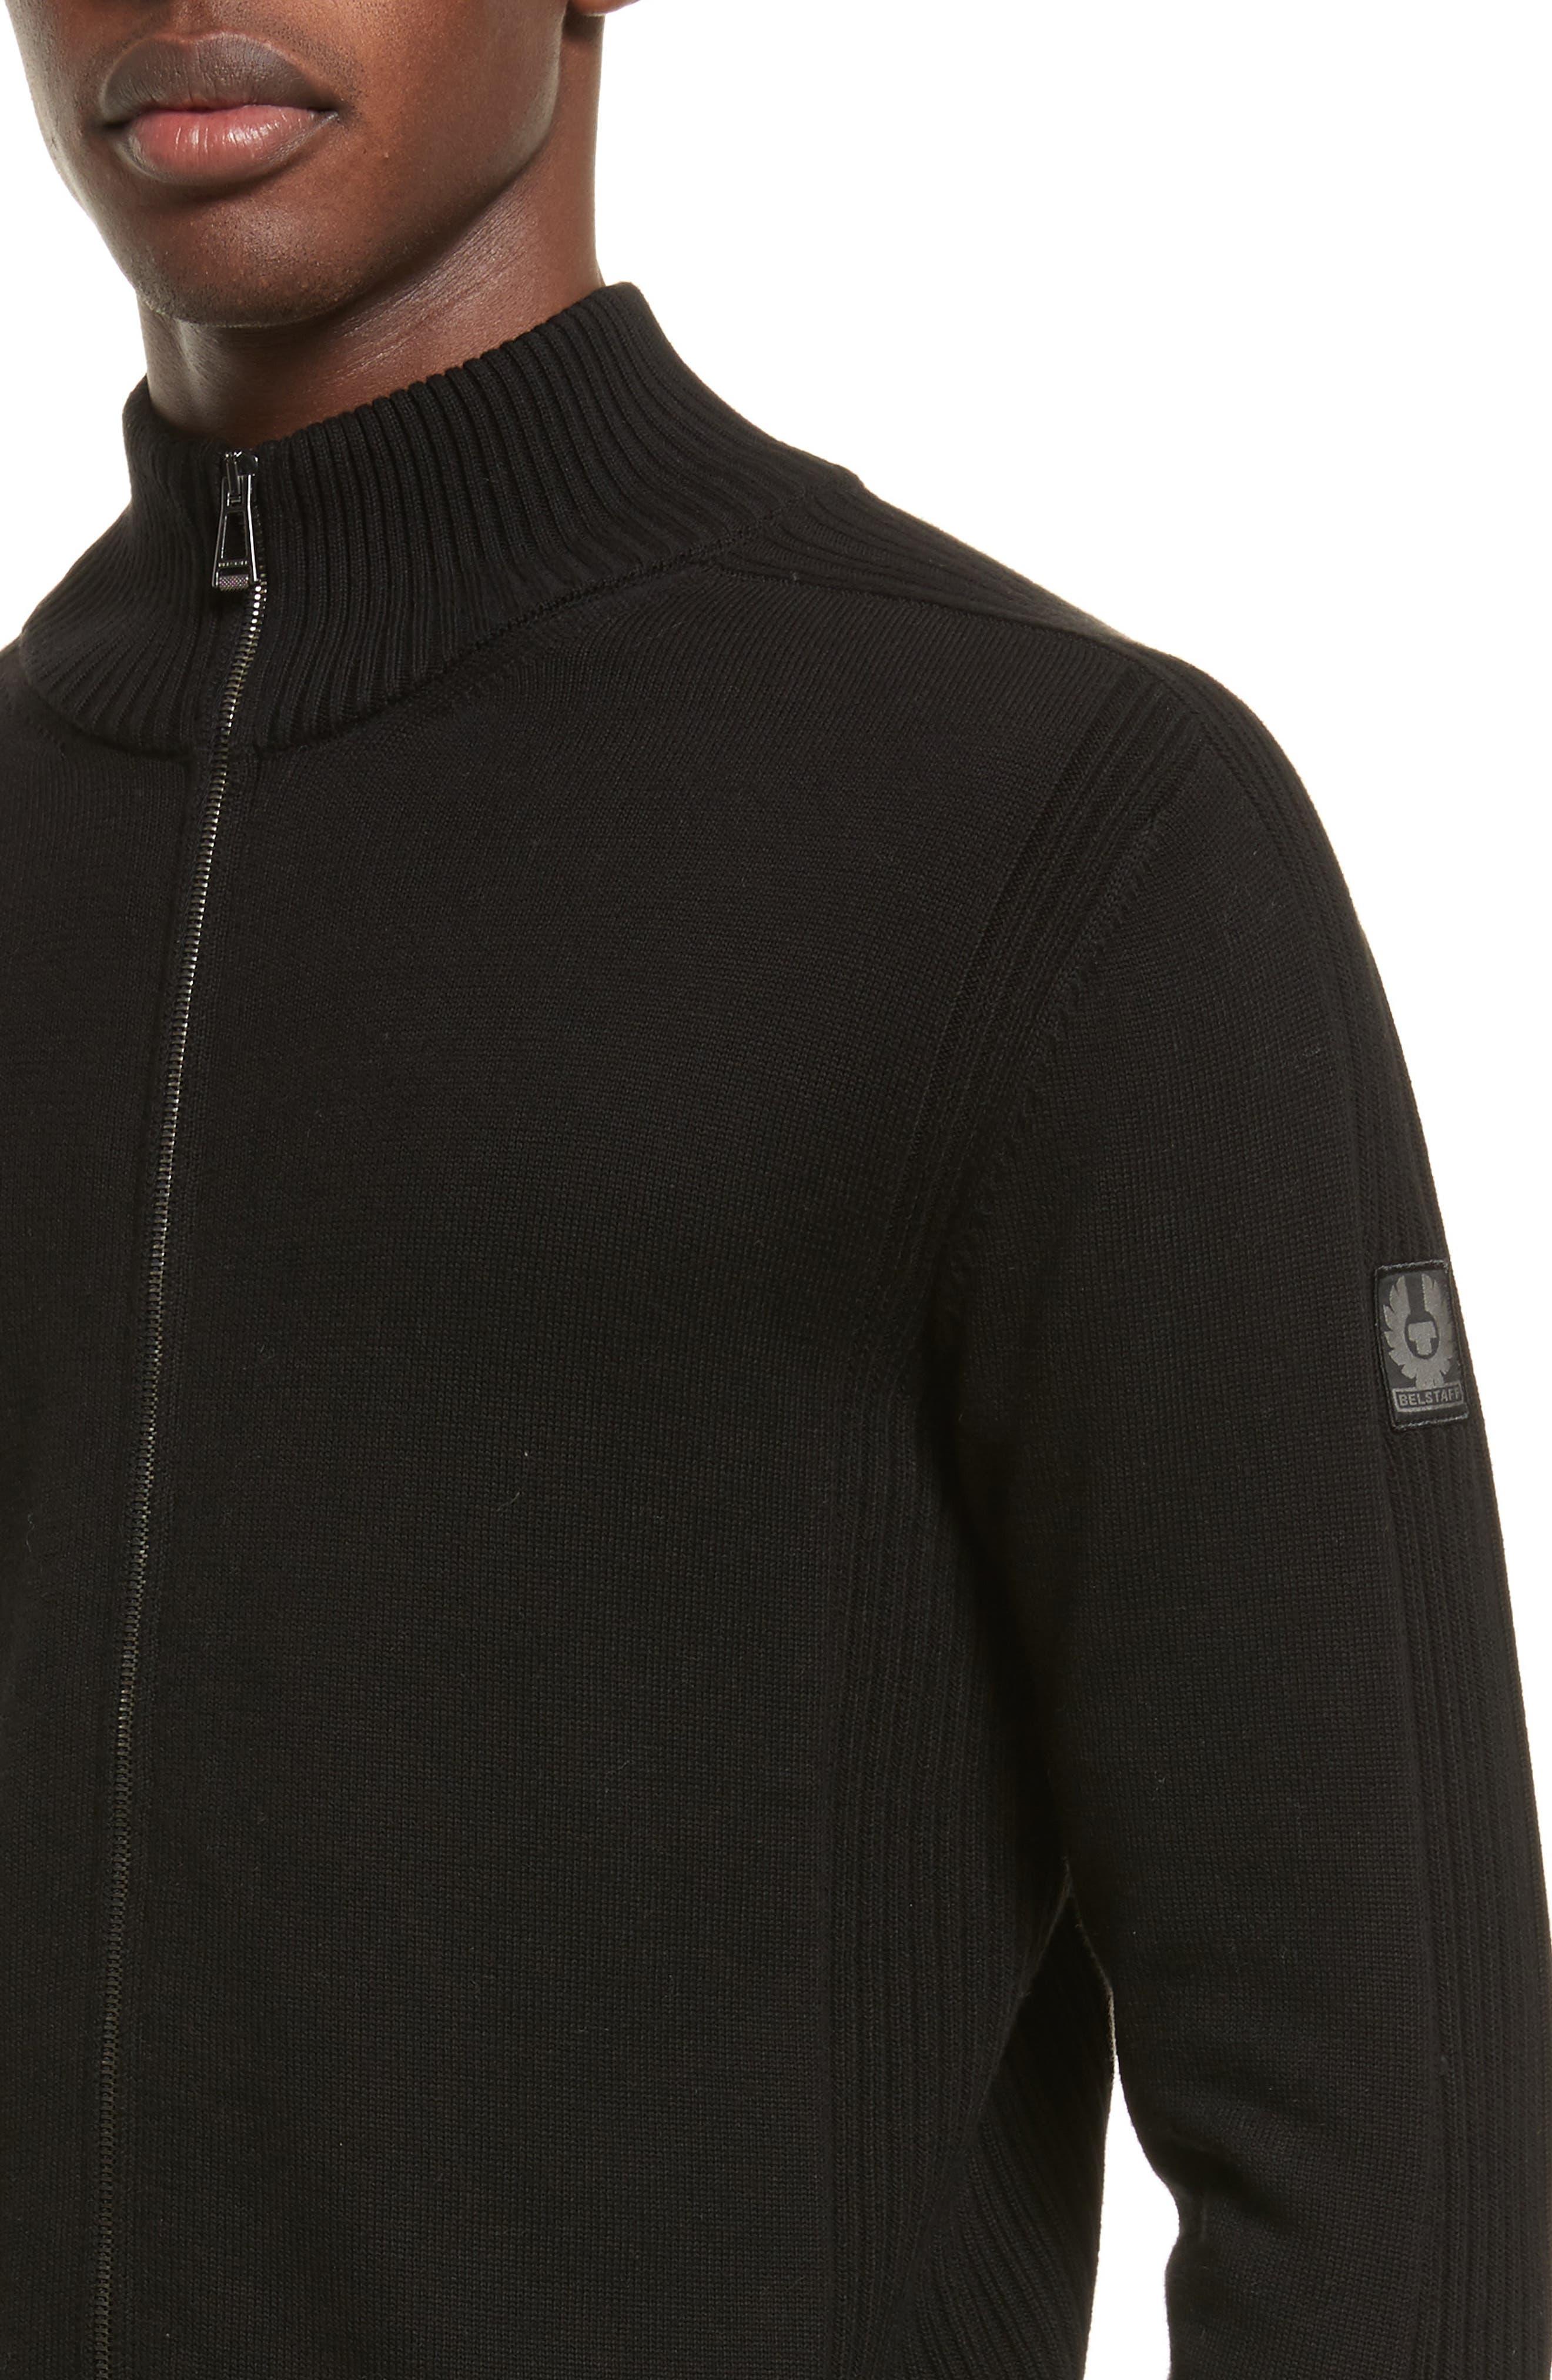 Allerford Knit Cotton Jacket,                             Alternate thumbnail 4, color,                             Black